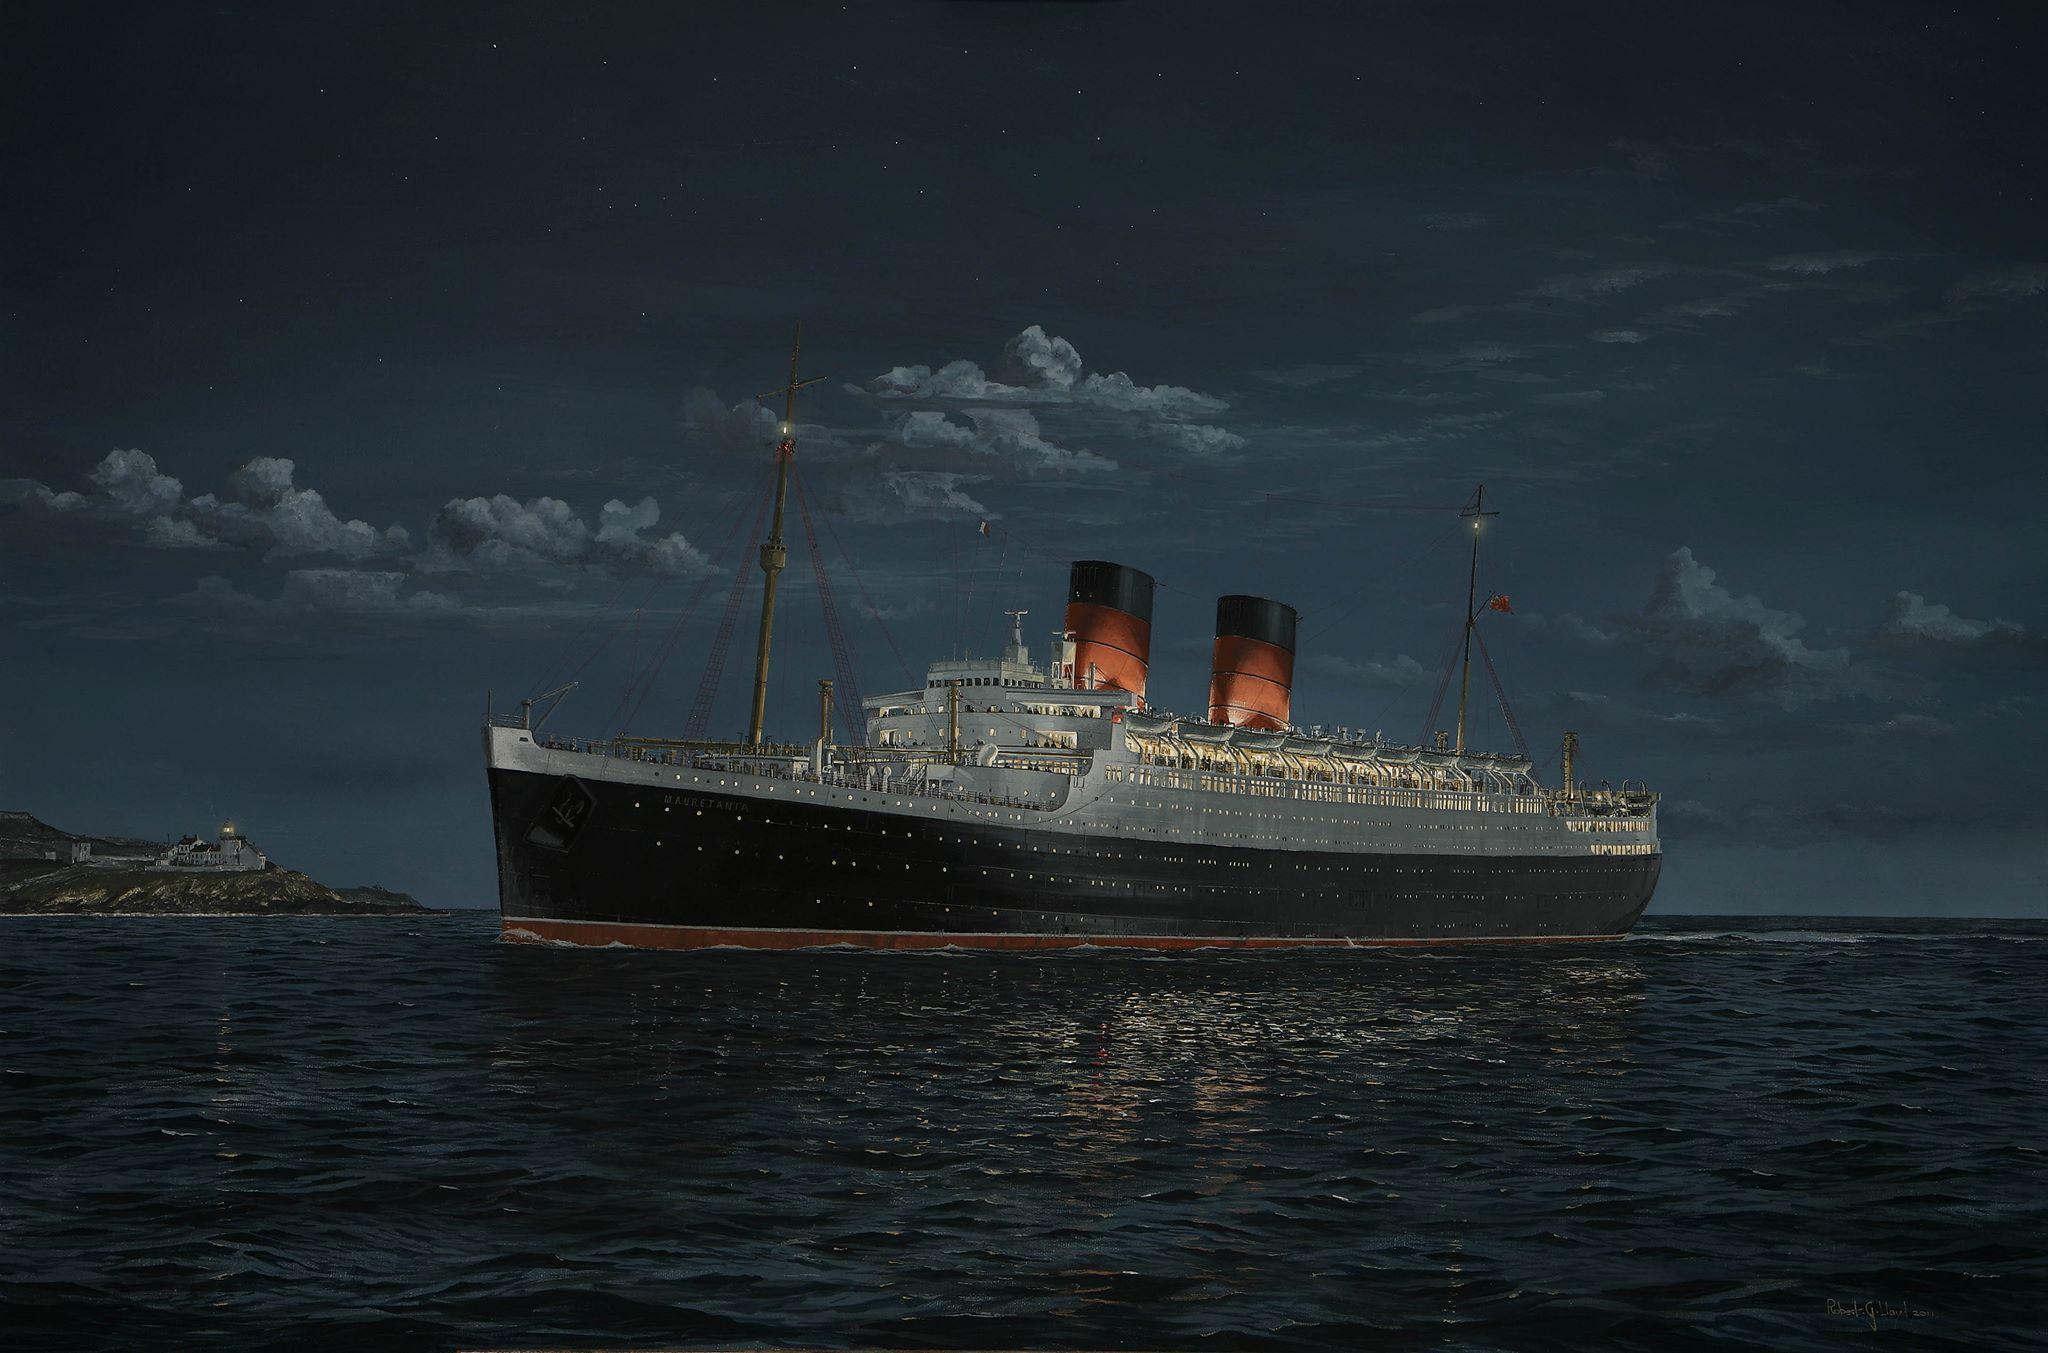 Mauretania, Cunard Line. Mauretania departed Liverpool on her maiden voyage on 16 November 1907.